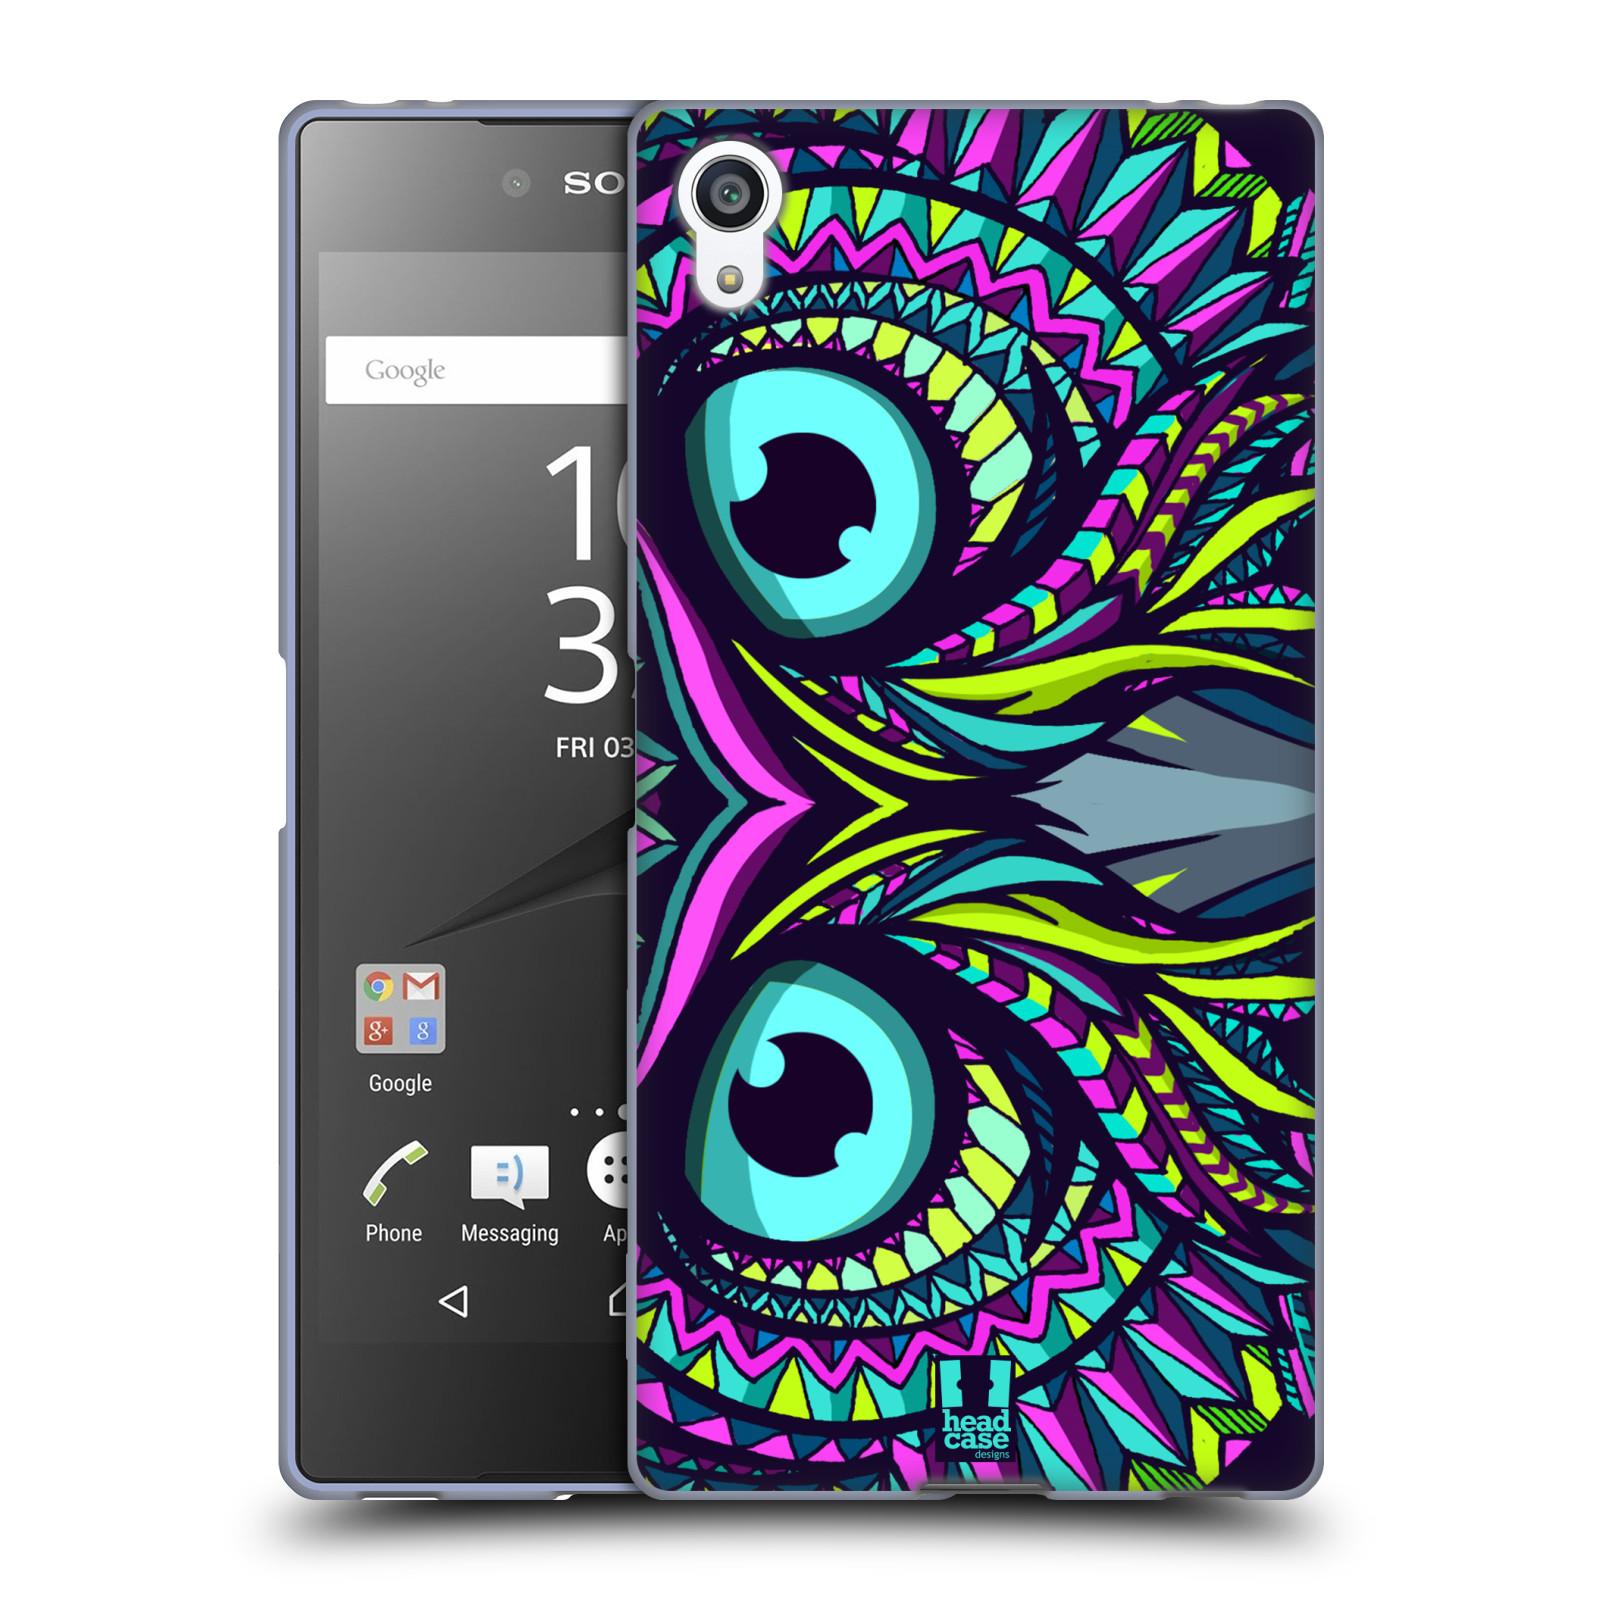 Silikonové pouzdro na mobil Sony Xperia Z5 Premium HEAD CASE AZTEC SOVA